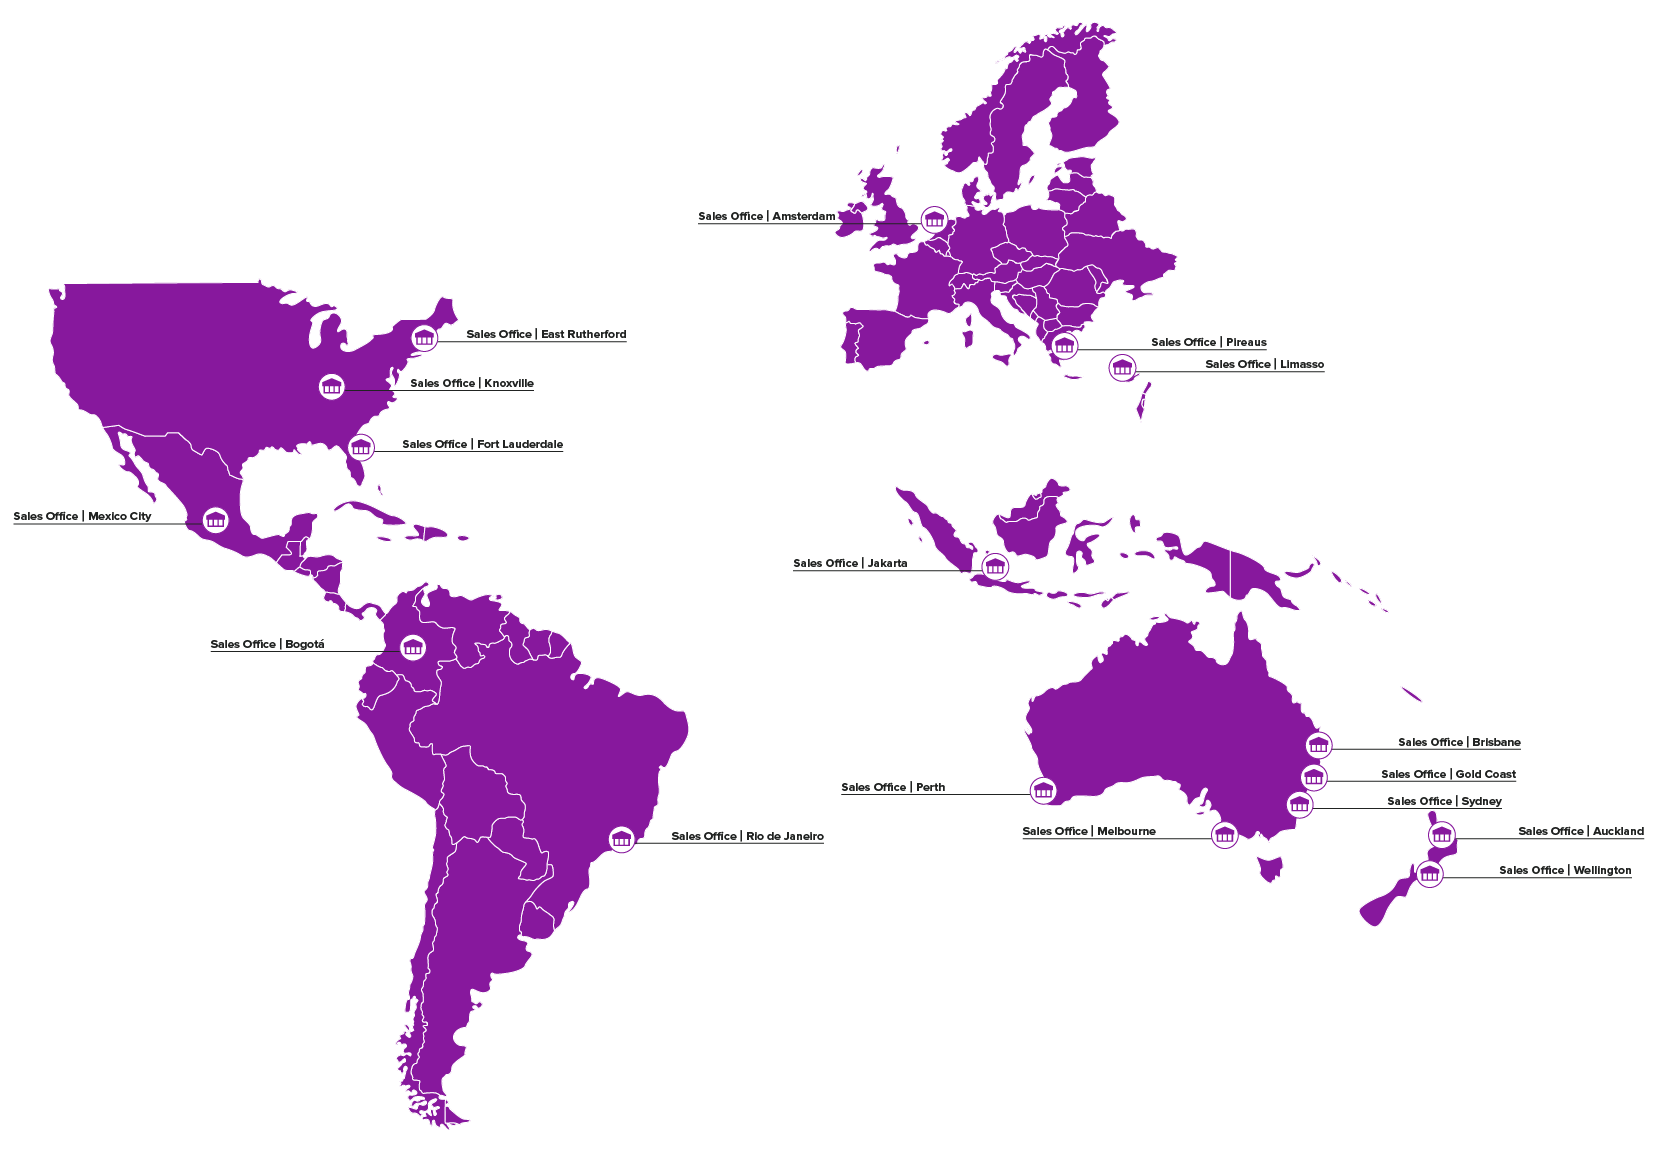 Pivotel Global Locations Map 2021